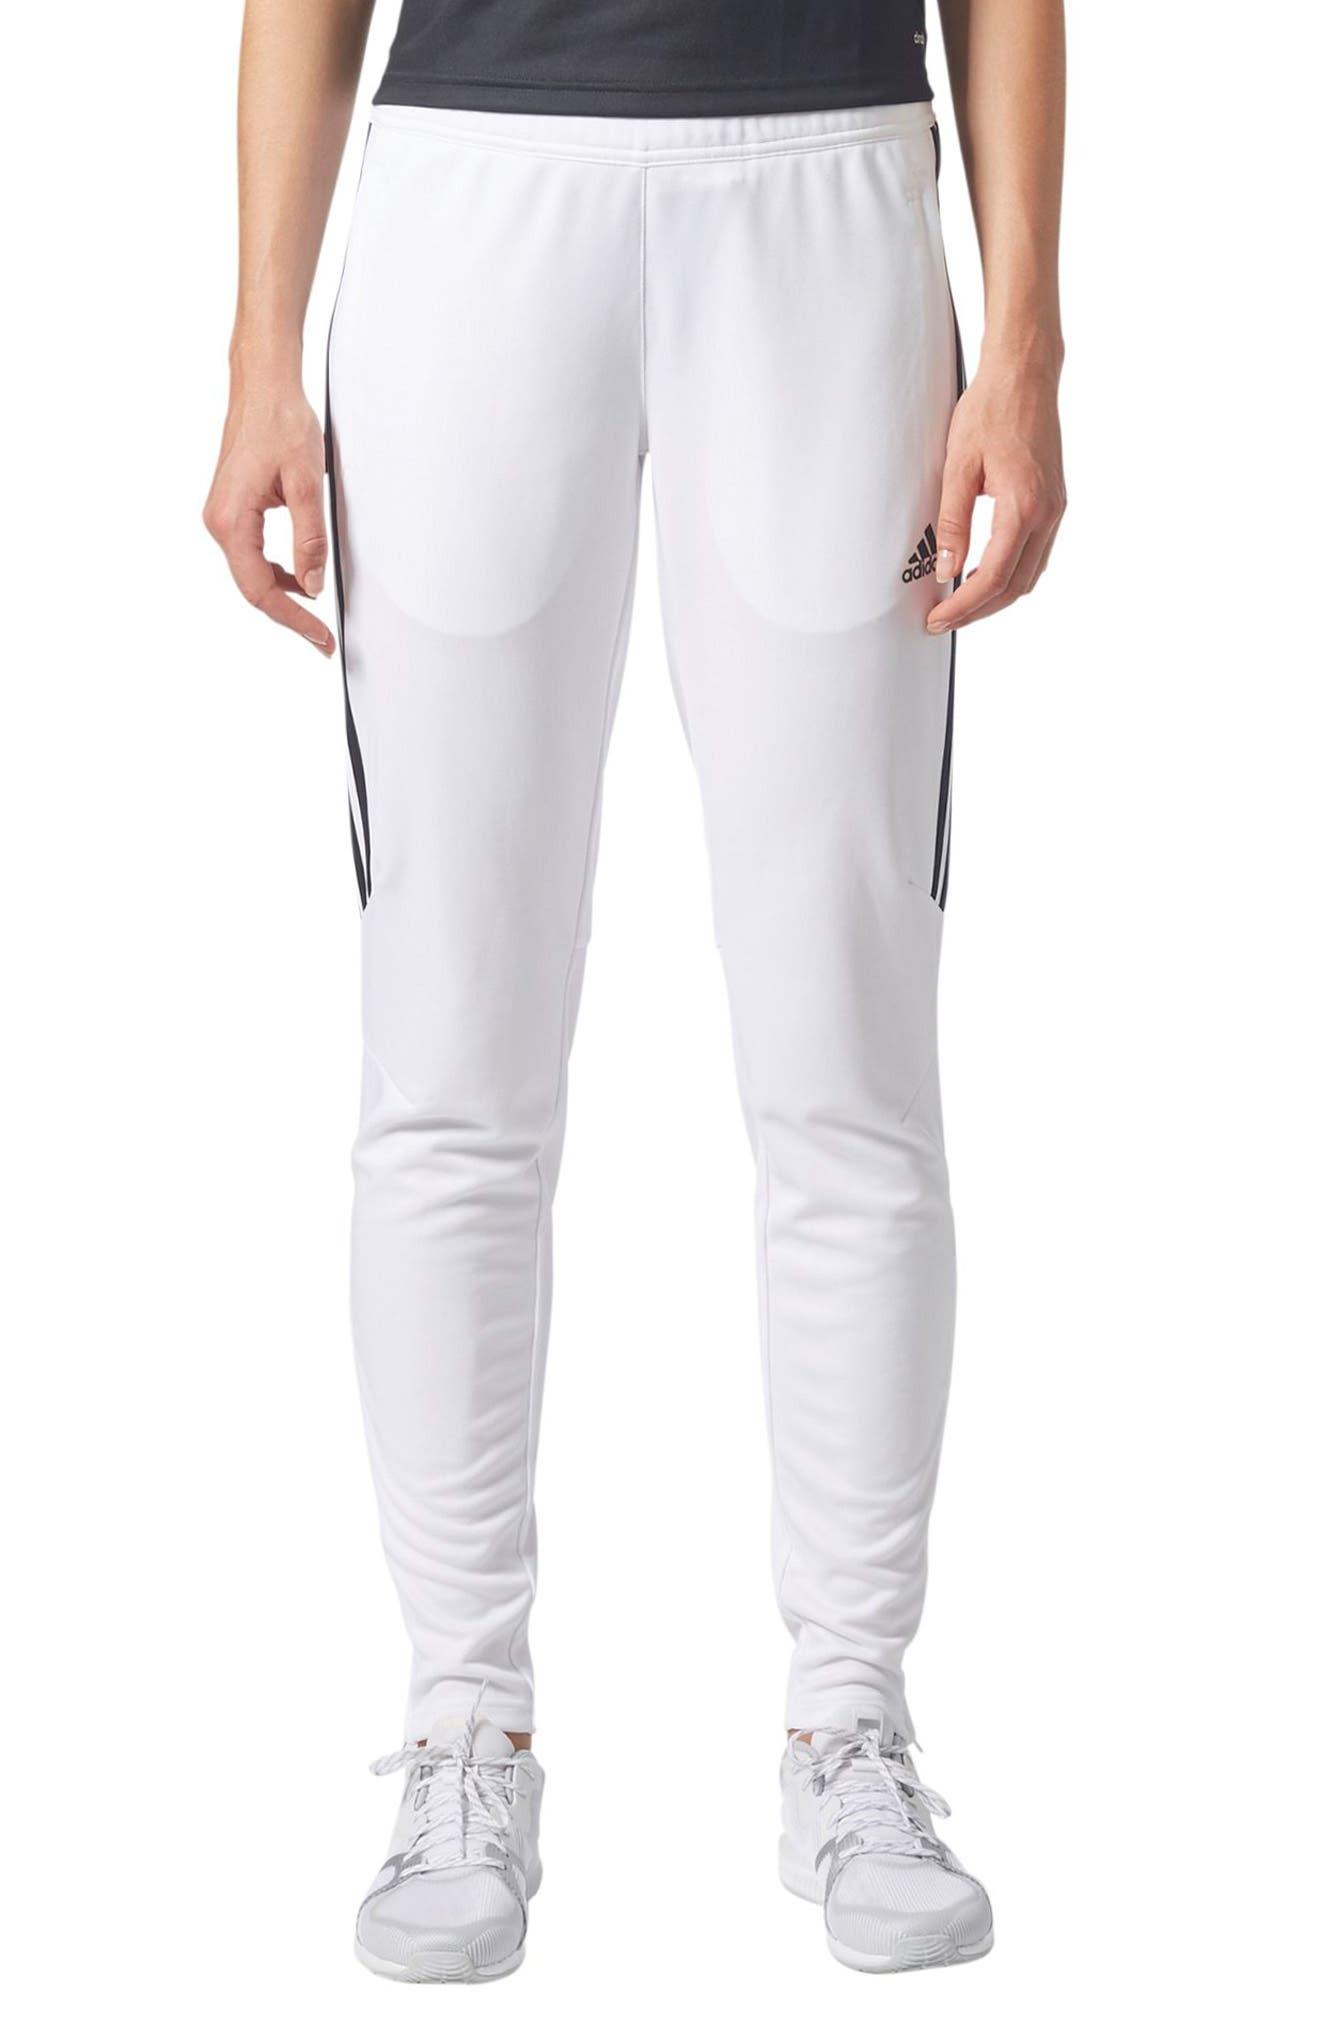 best service 1e8a0 2eef4 Adidas Tiro Climacool Soccer Pants, White/Black